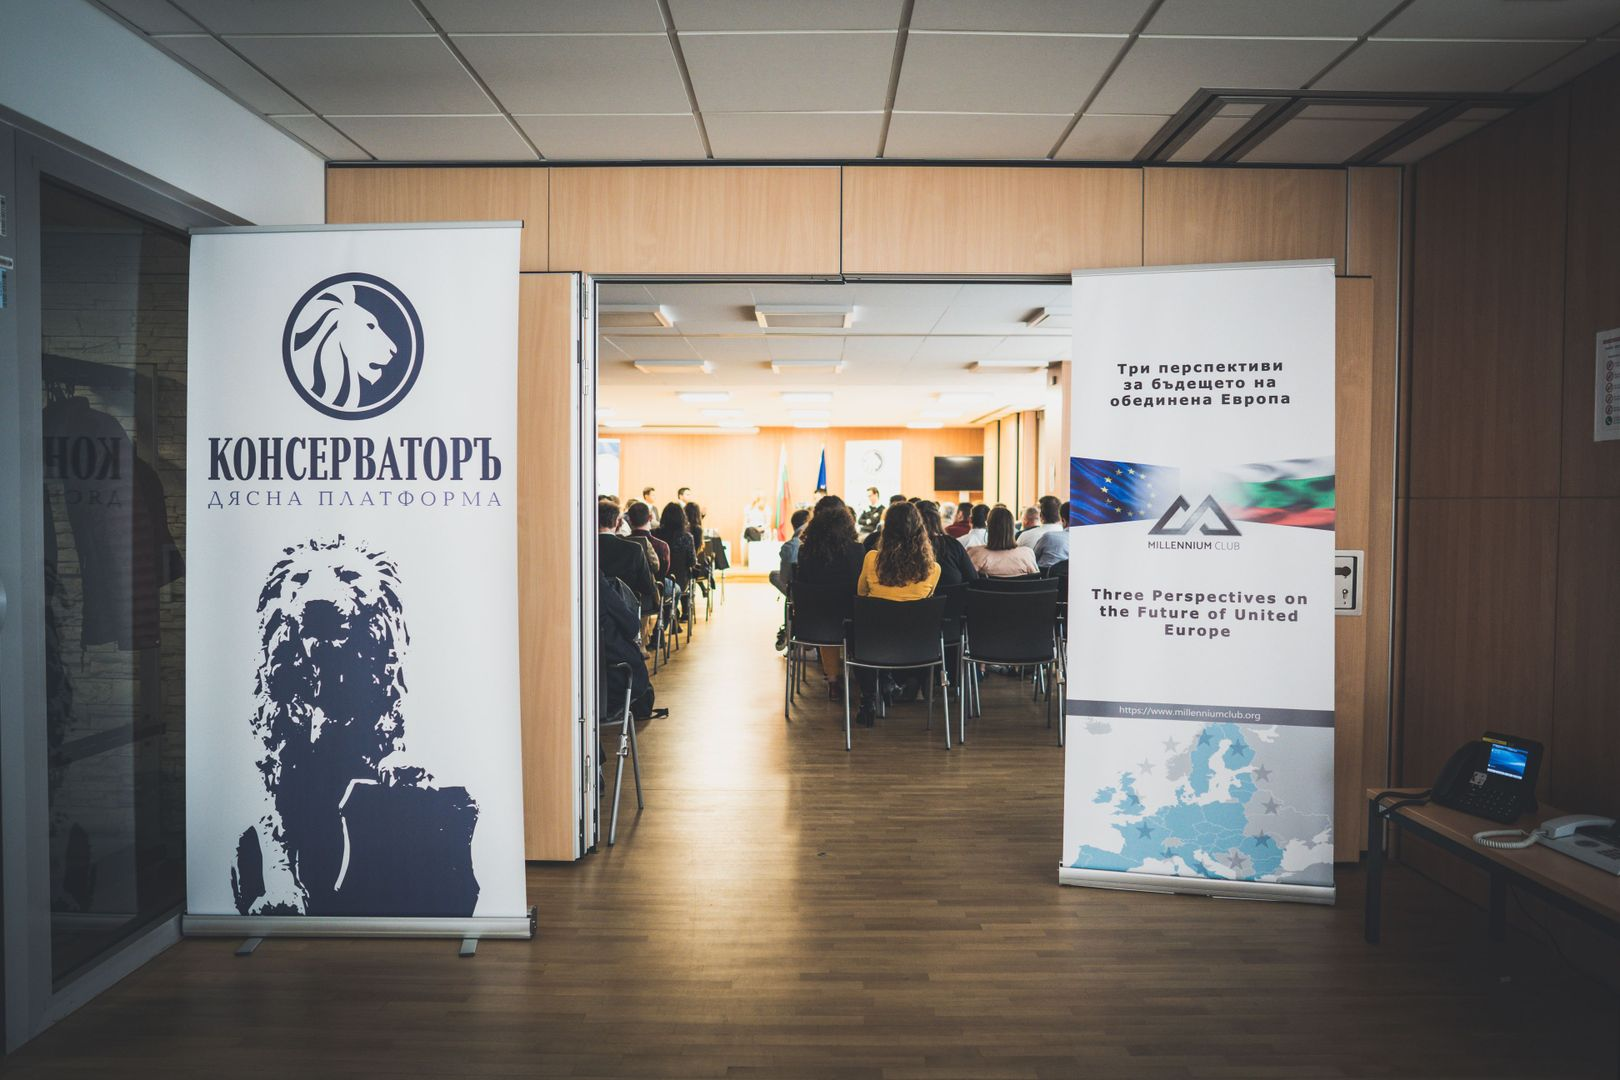 conservative-millenium-strongeurope-event-april-56